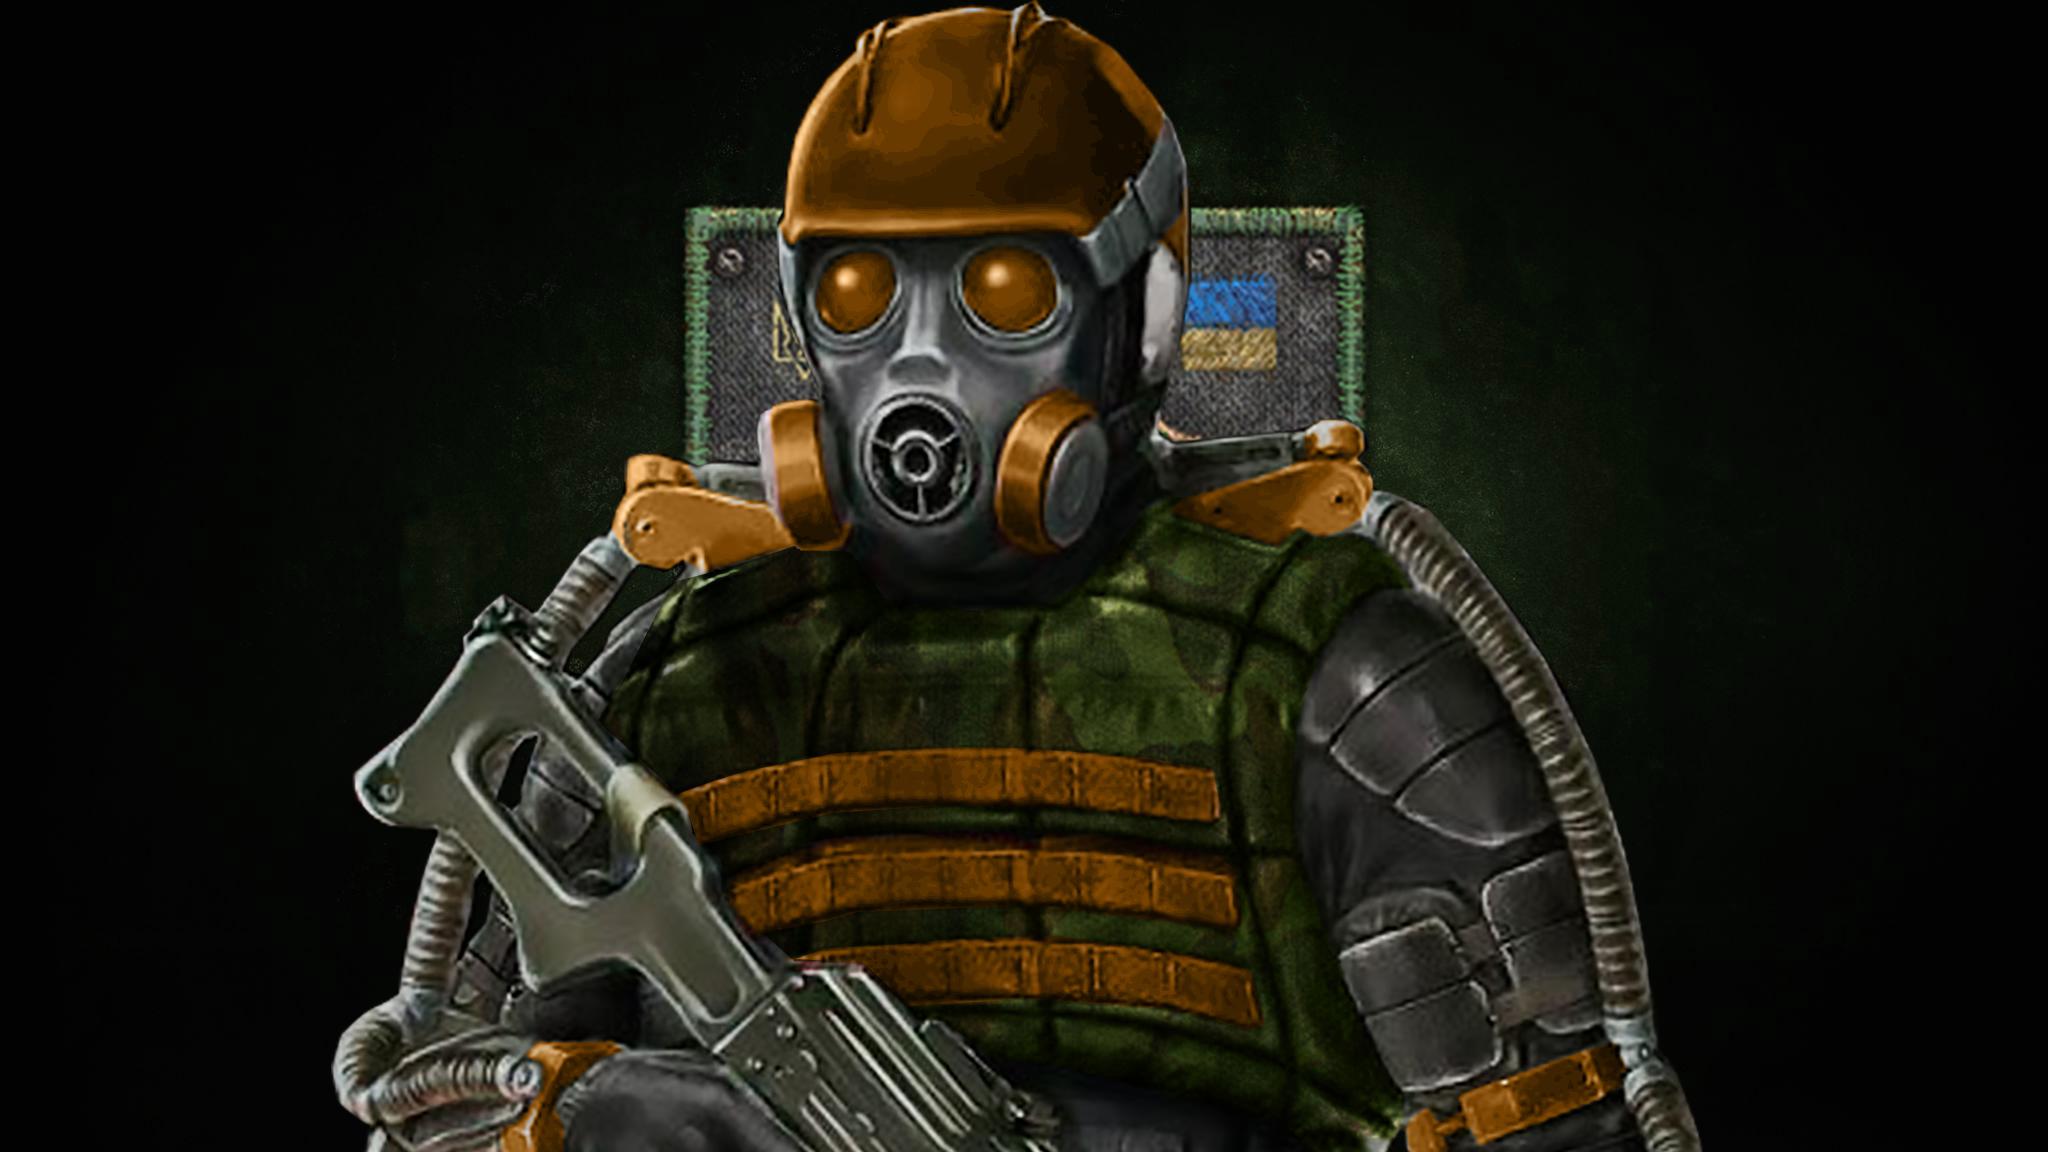 Для аватарок / обоев - S.T.A.L.K.E.R.: Shadow of Chernobyl